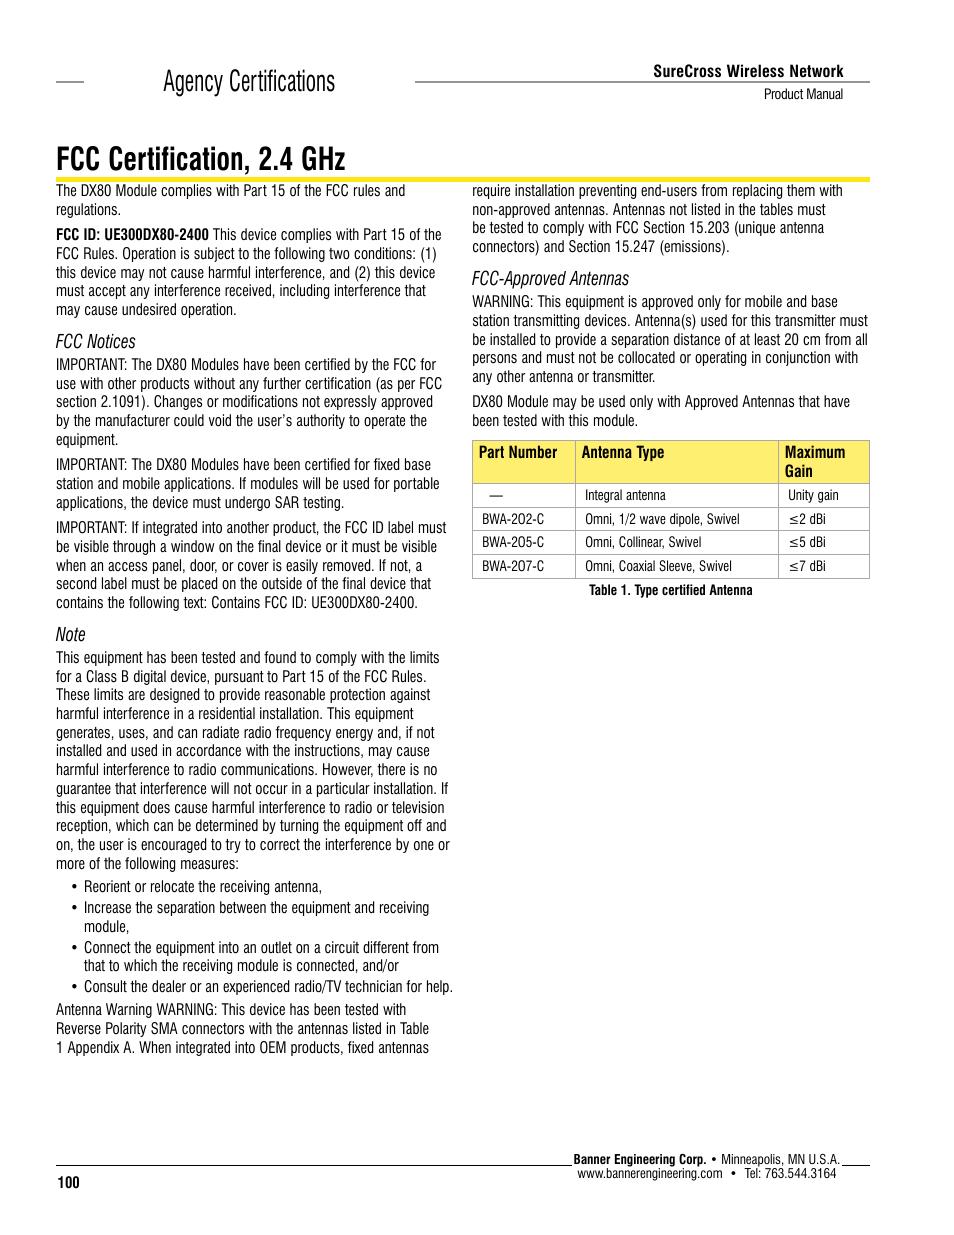 Fcc Certification 24 Ghz Agency Certifications Banner Surecross